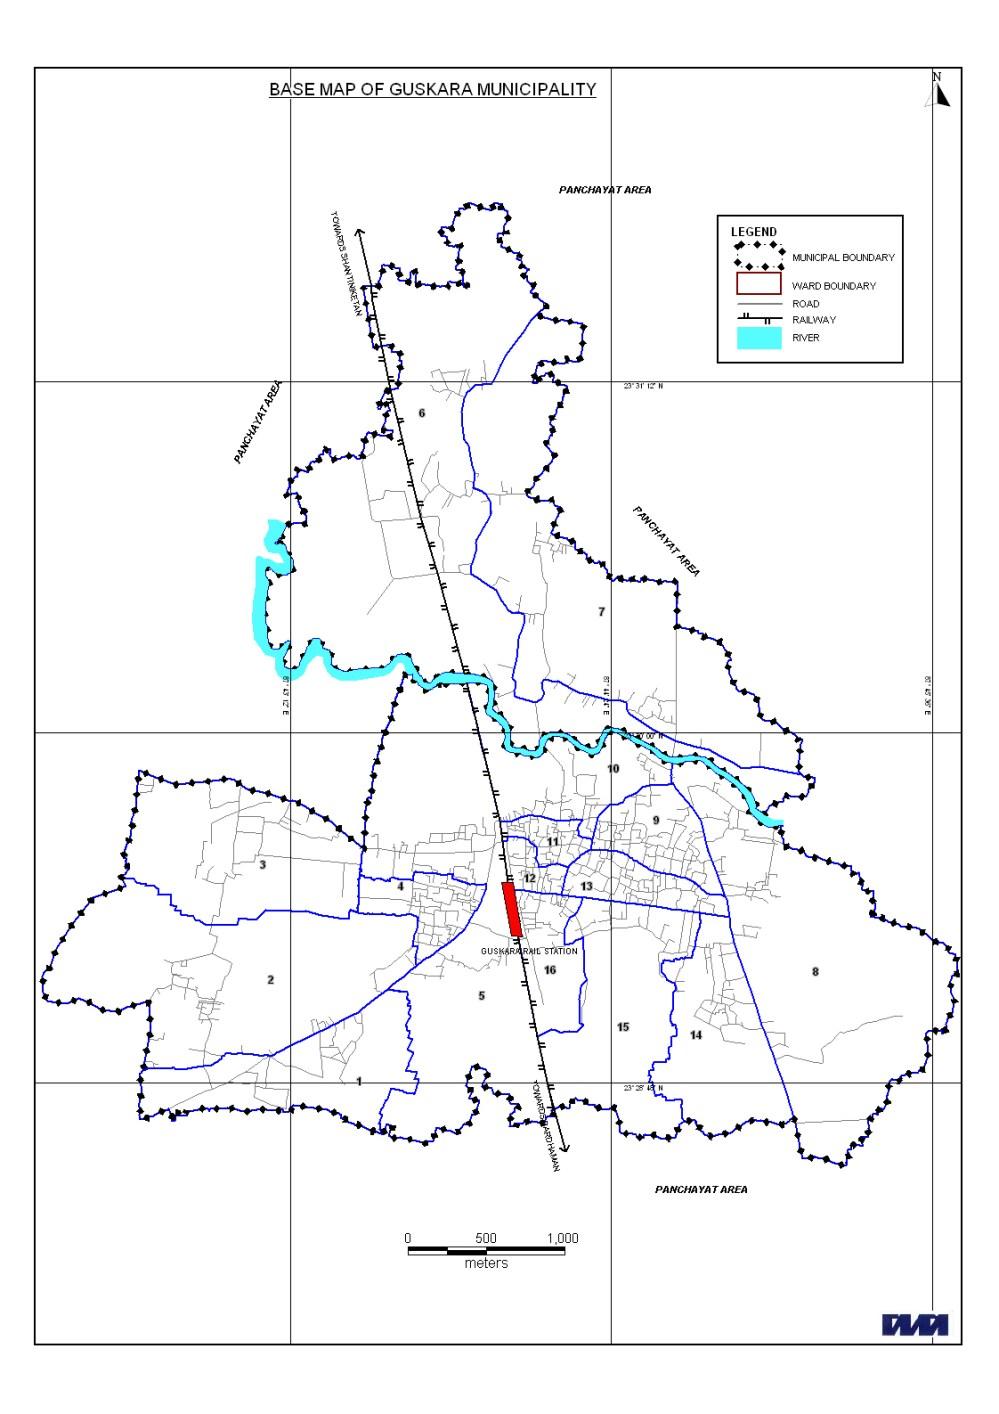 medium resolution of base map